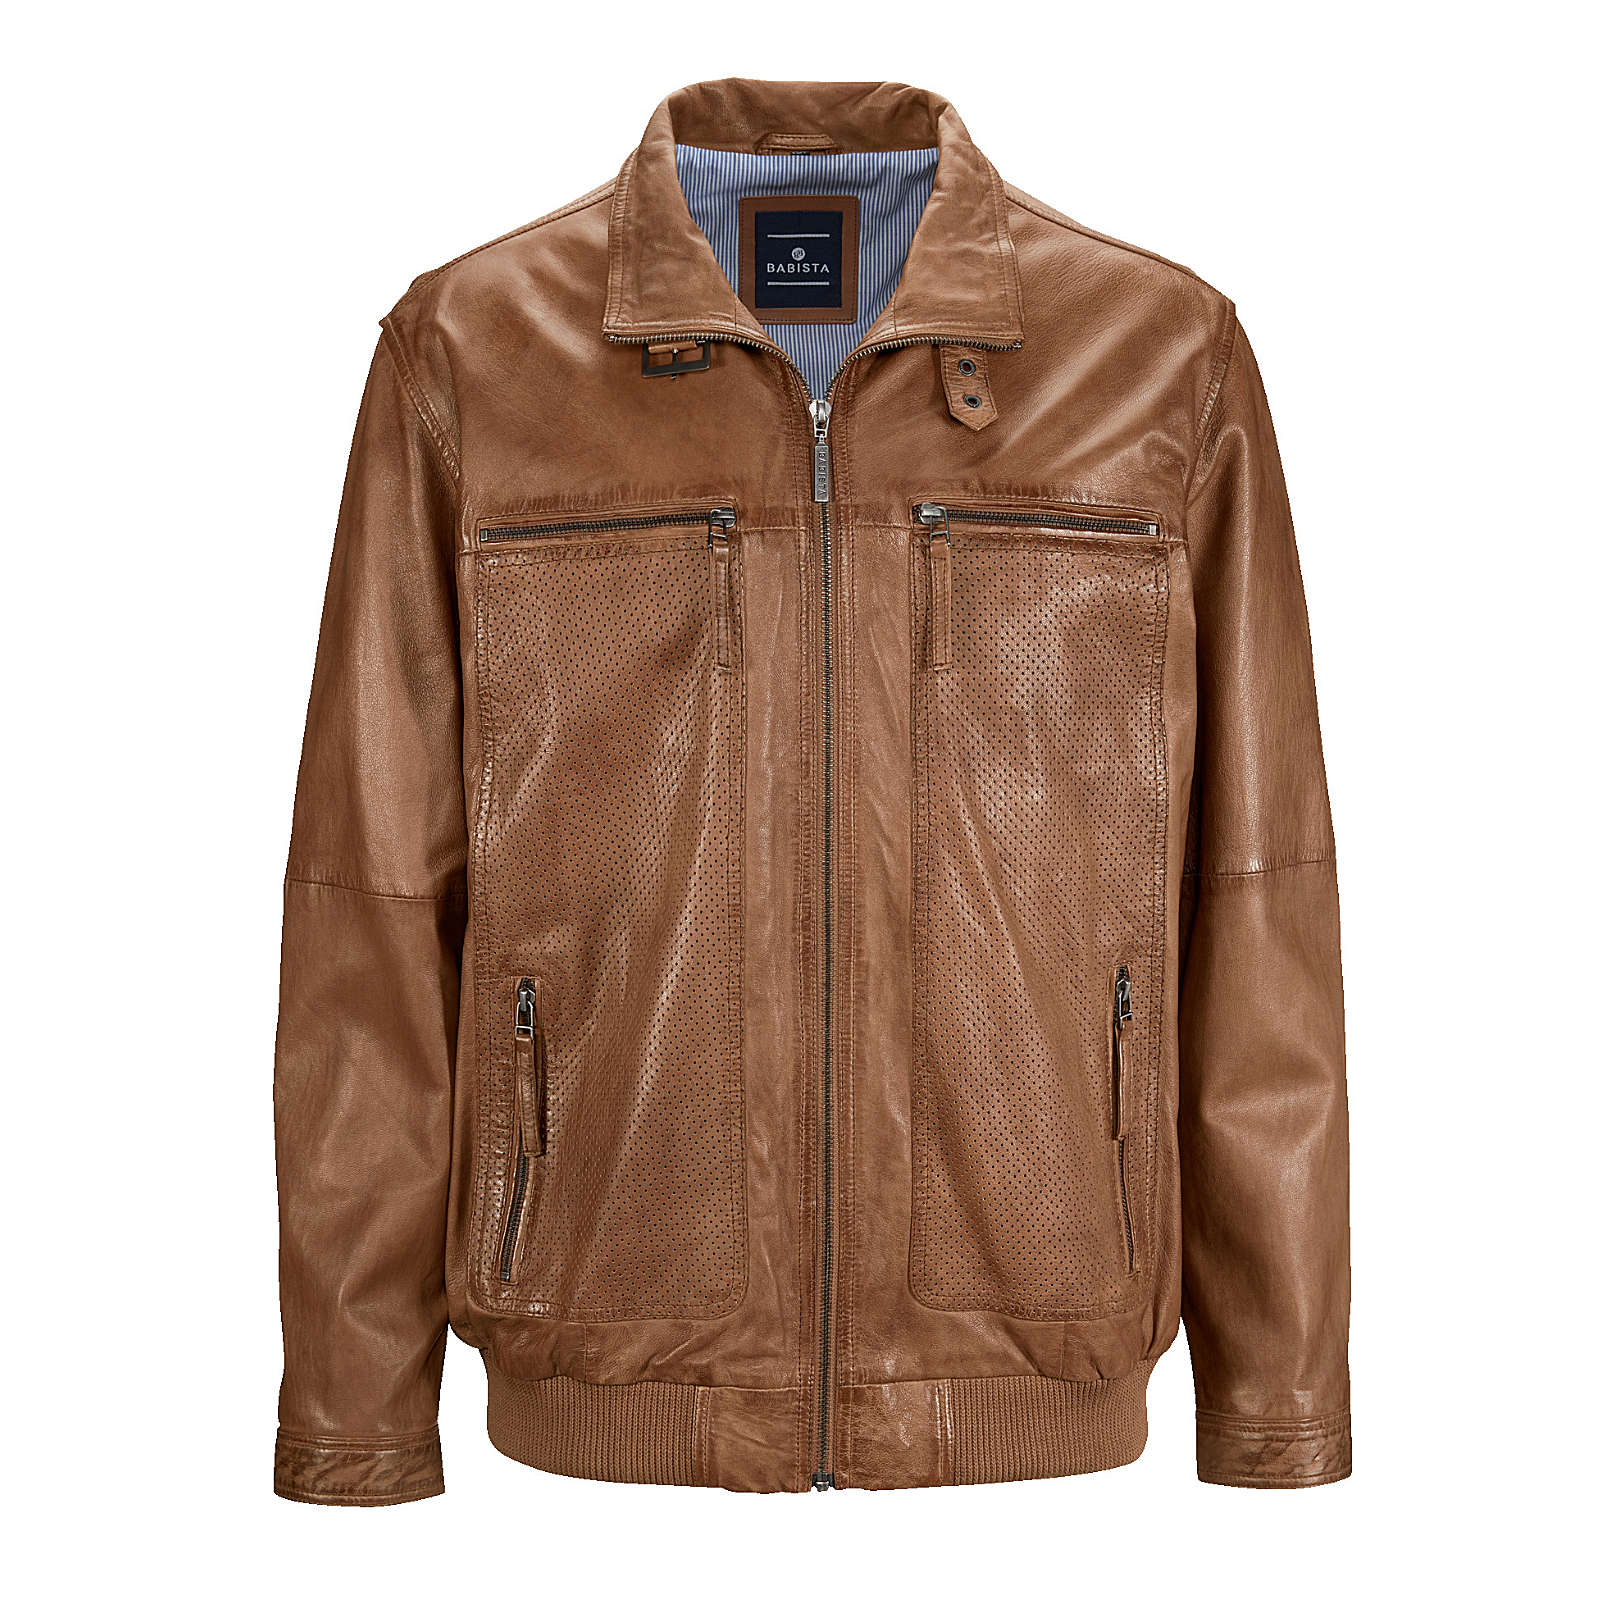 Rabatt-Preisvergleich.de - Bekleidung   Jacken   Lederjacken 65c1238f4e